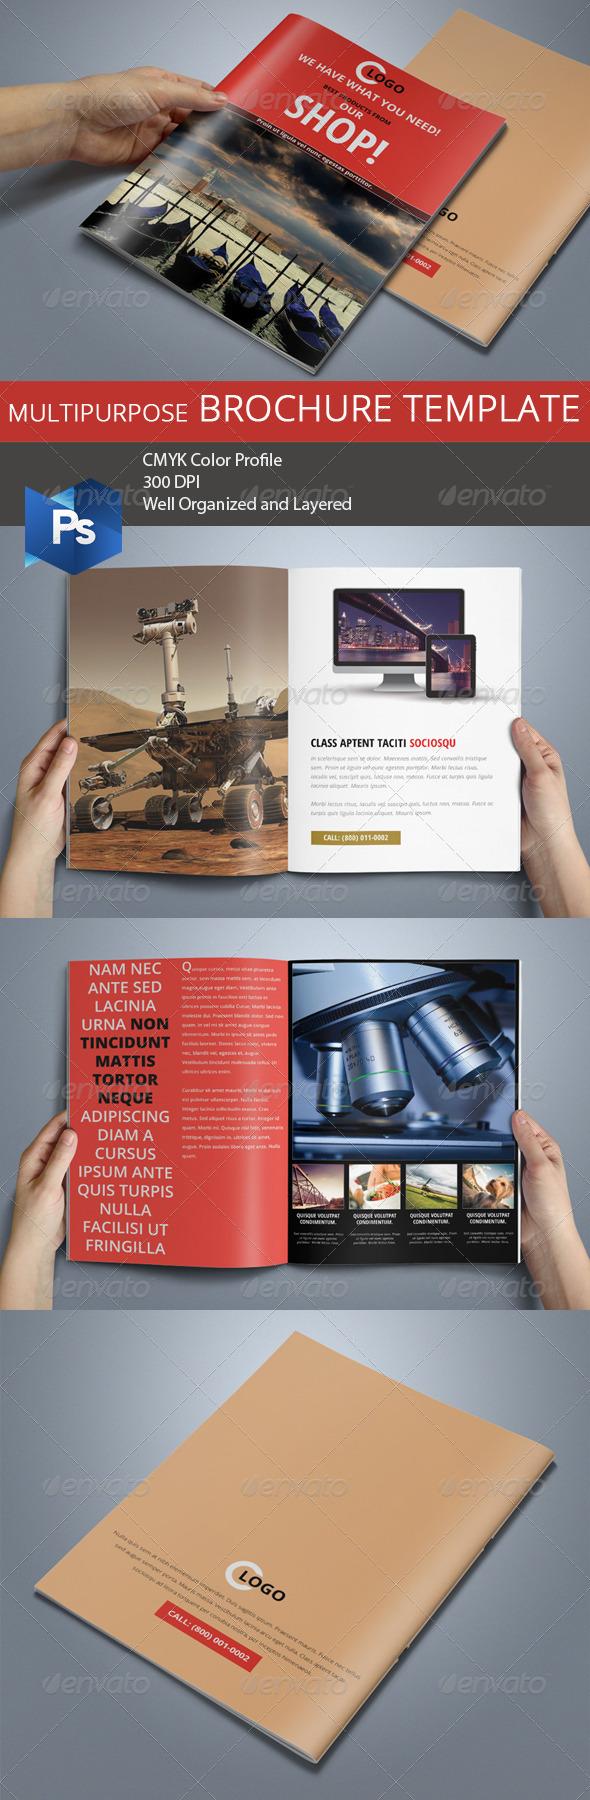 Multipurpose Business Brochure 02 - Corporate Brochures